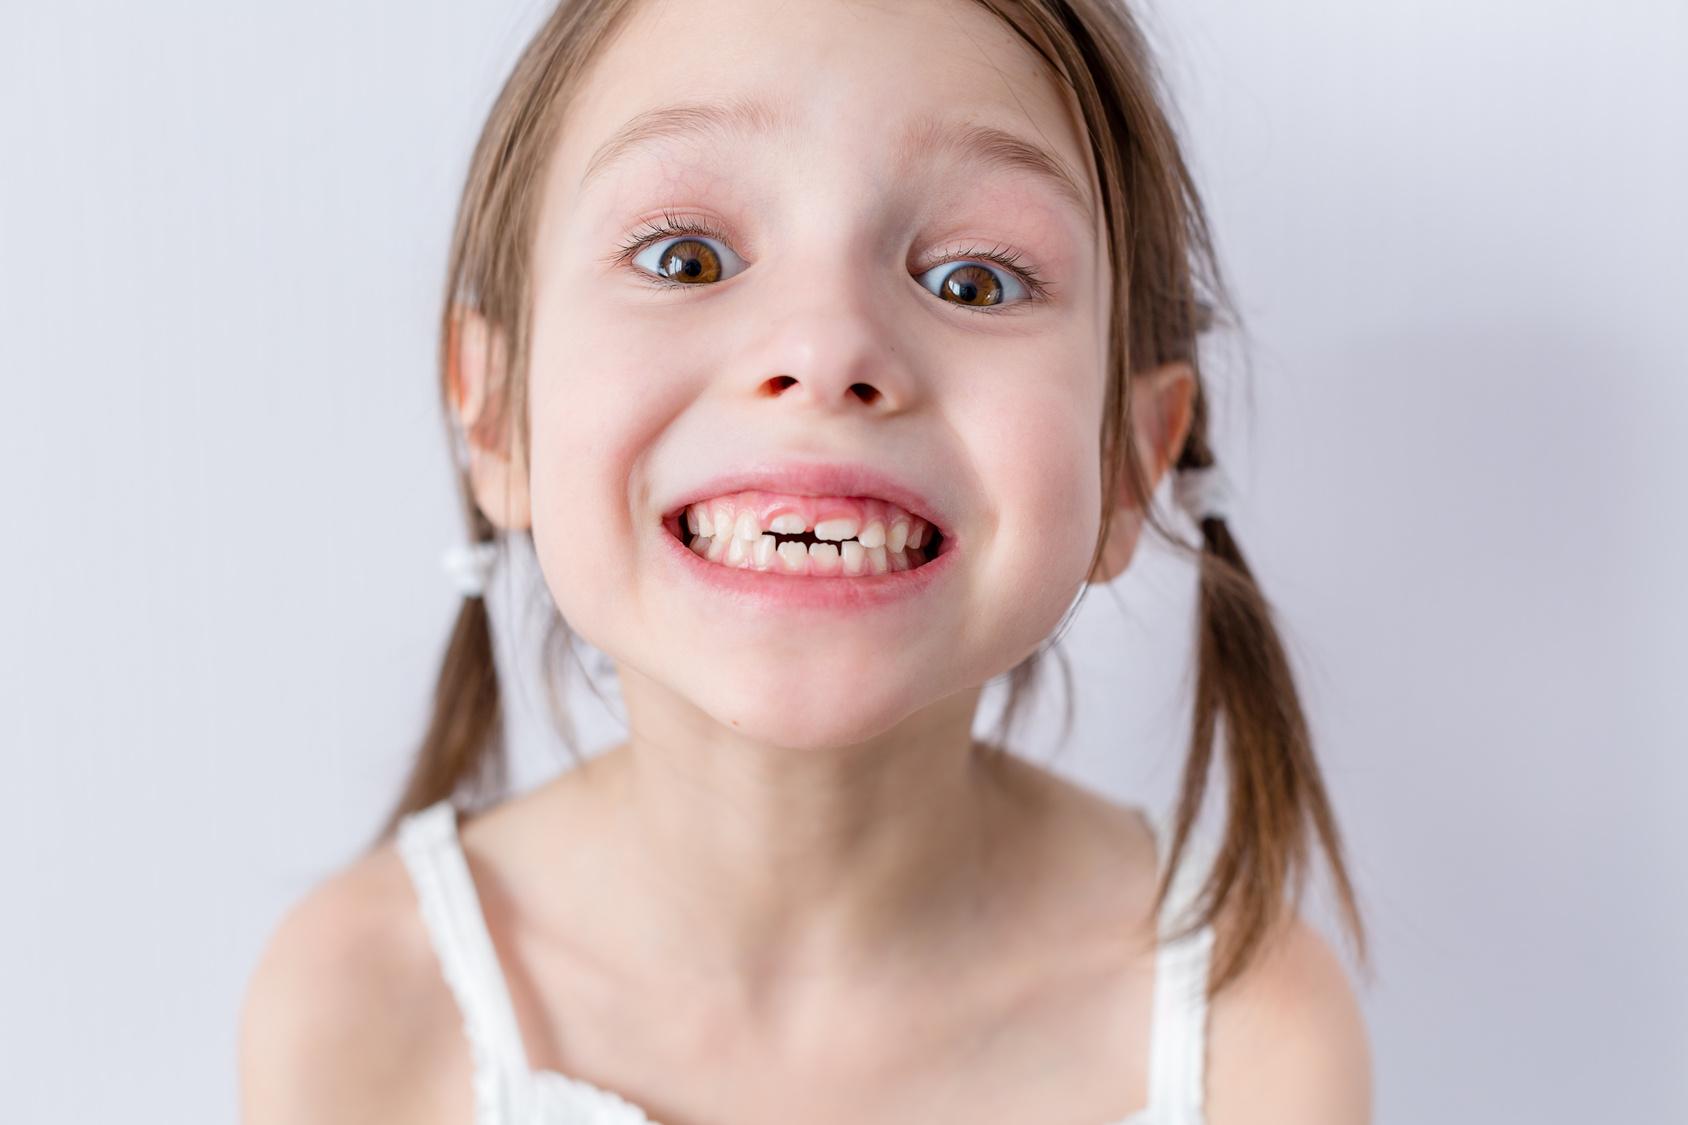 dientes leche dientes definitivos